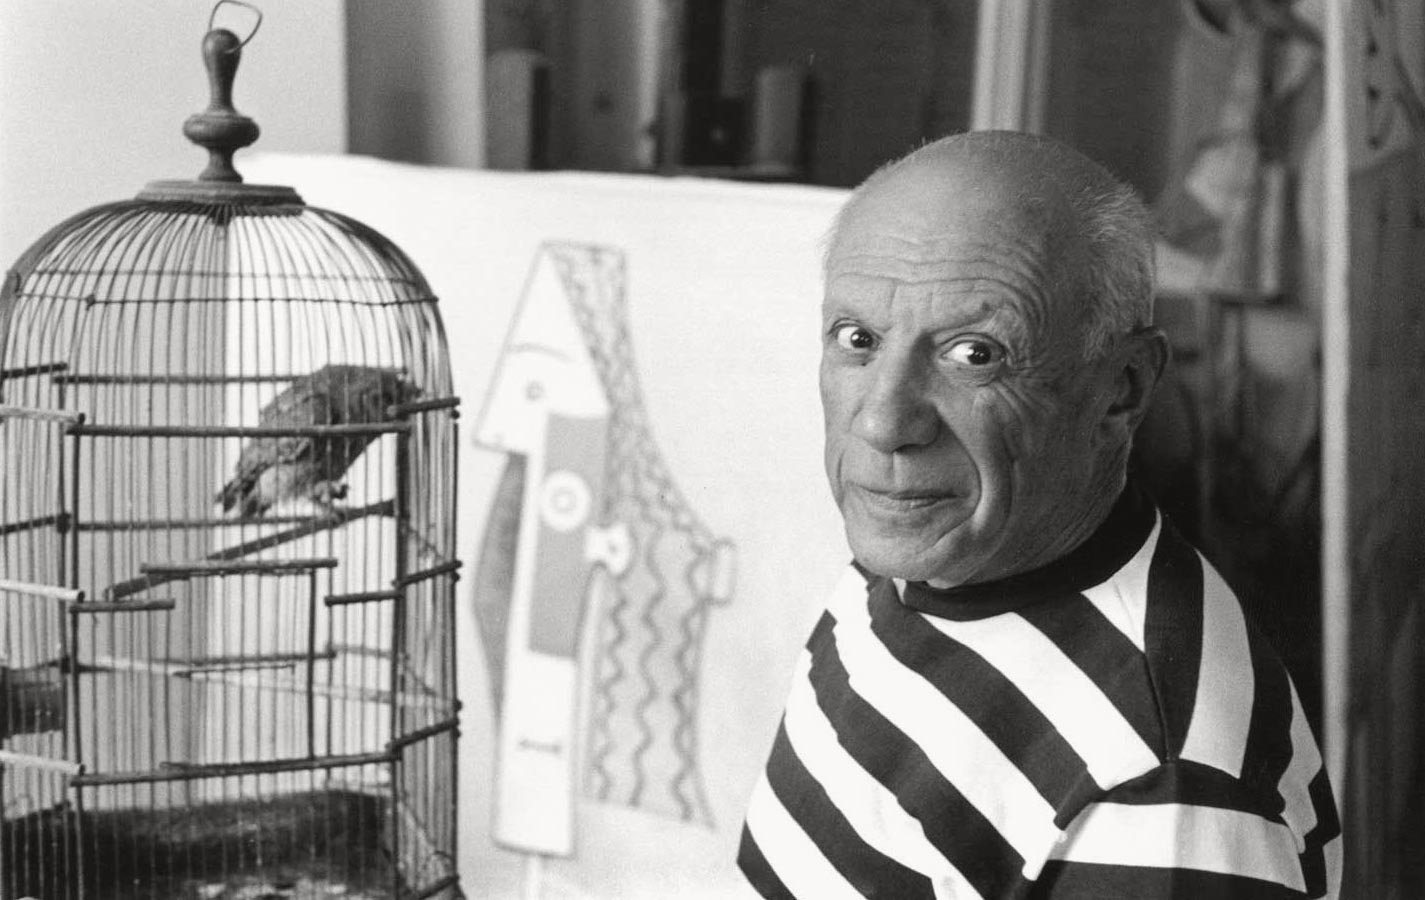 La mirada de Picasso